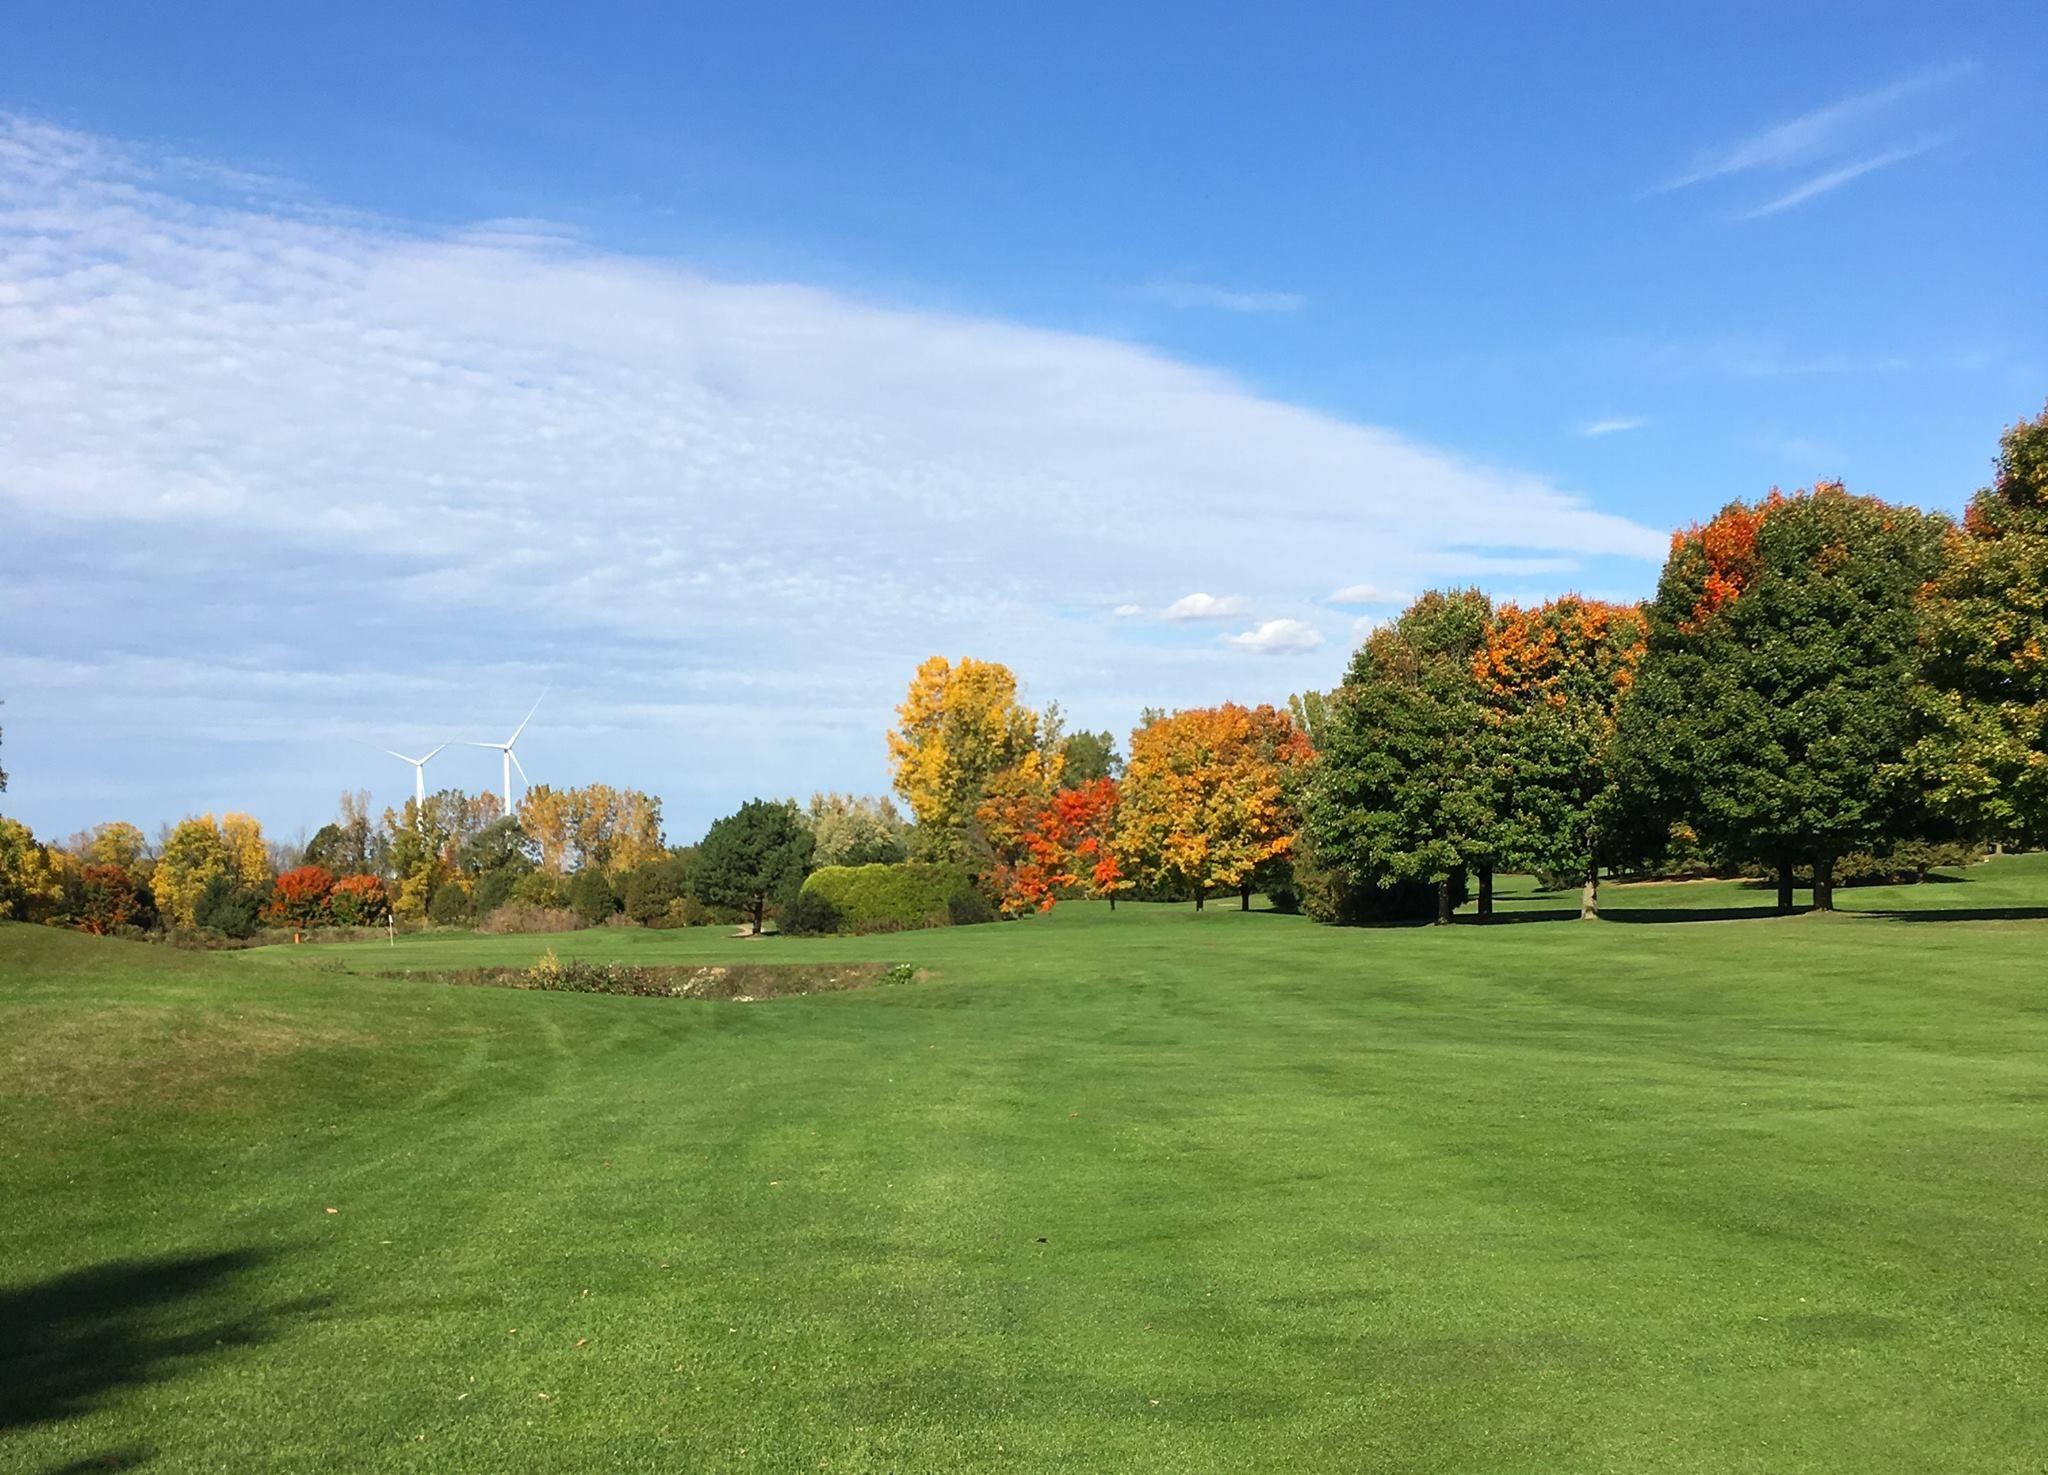 Arkona fairways golf course cover picture